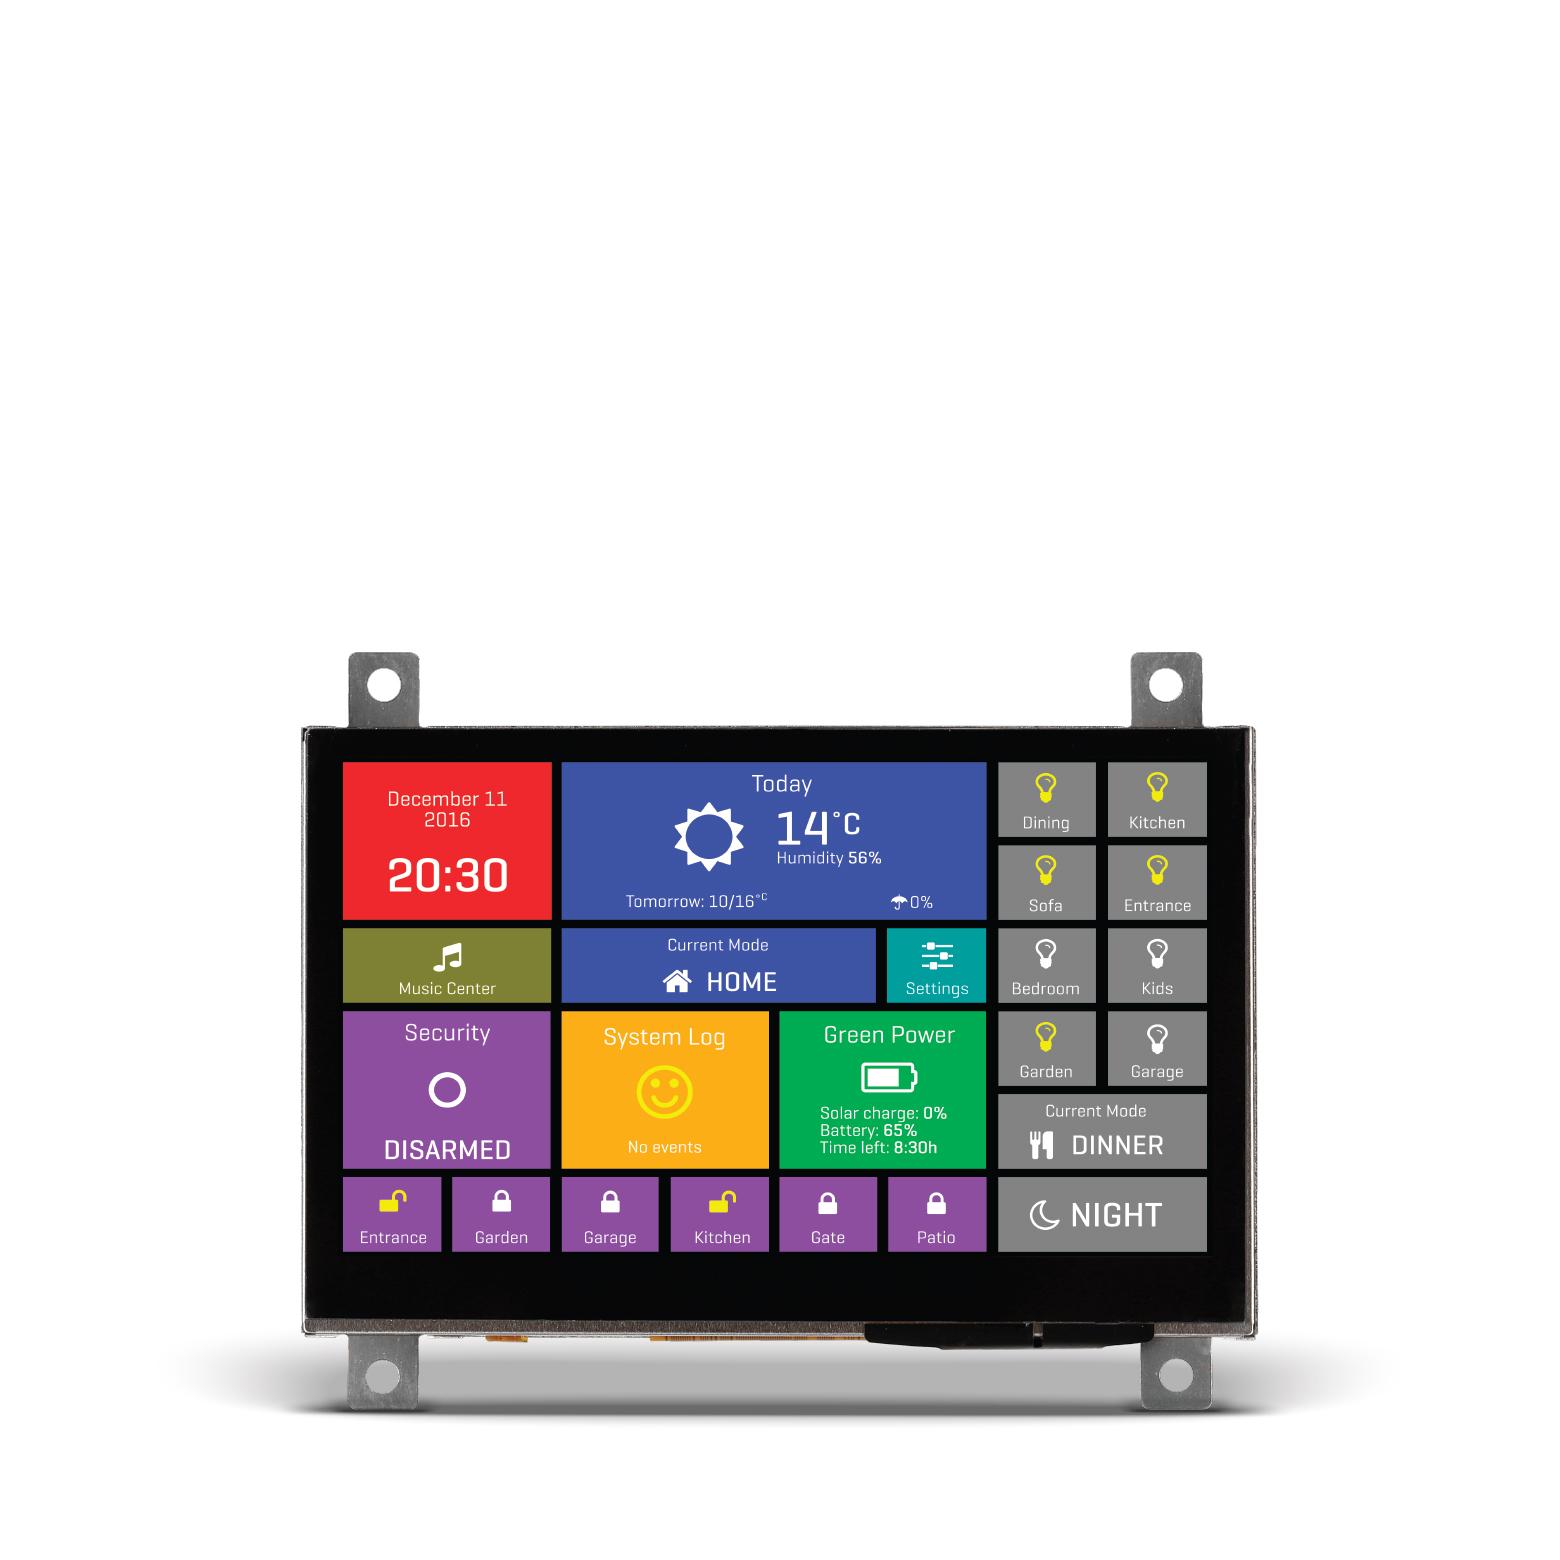 Mikromedia HMI with Capacitive screen